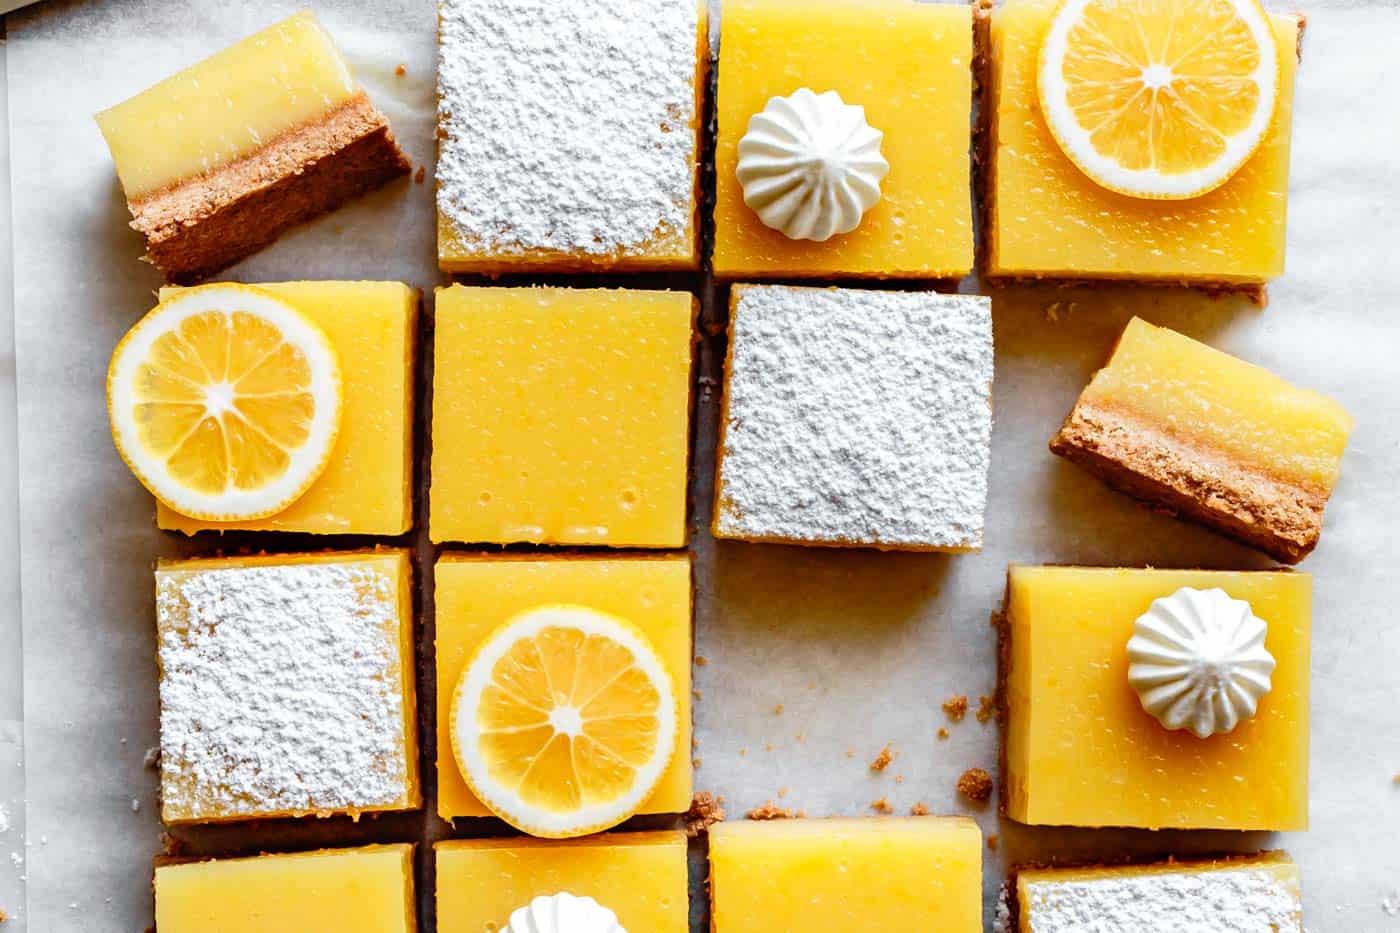 Gluten-free lemon bars with almond flour crust